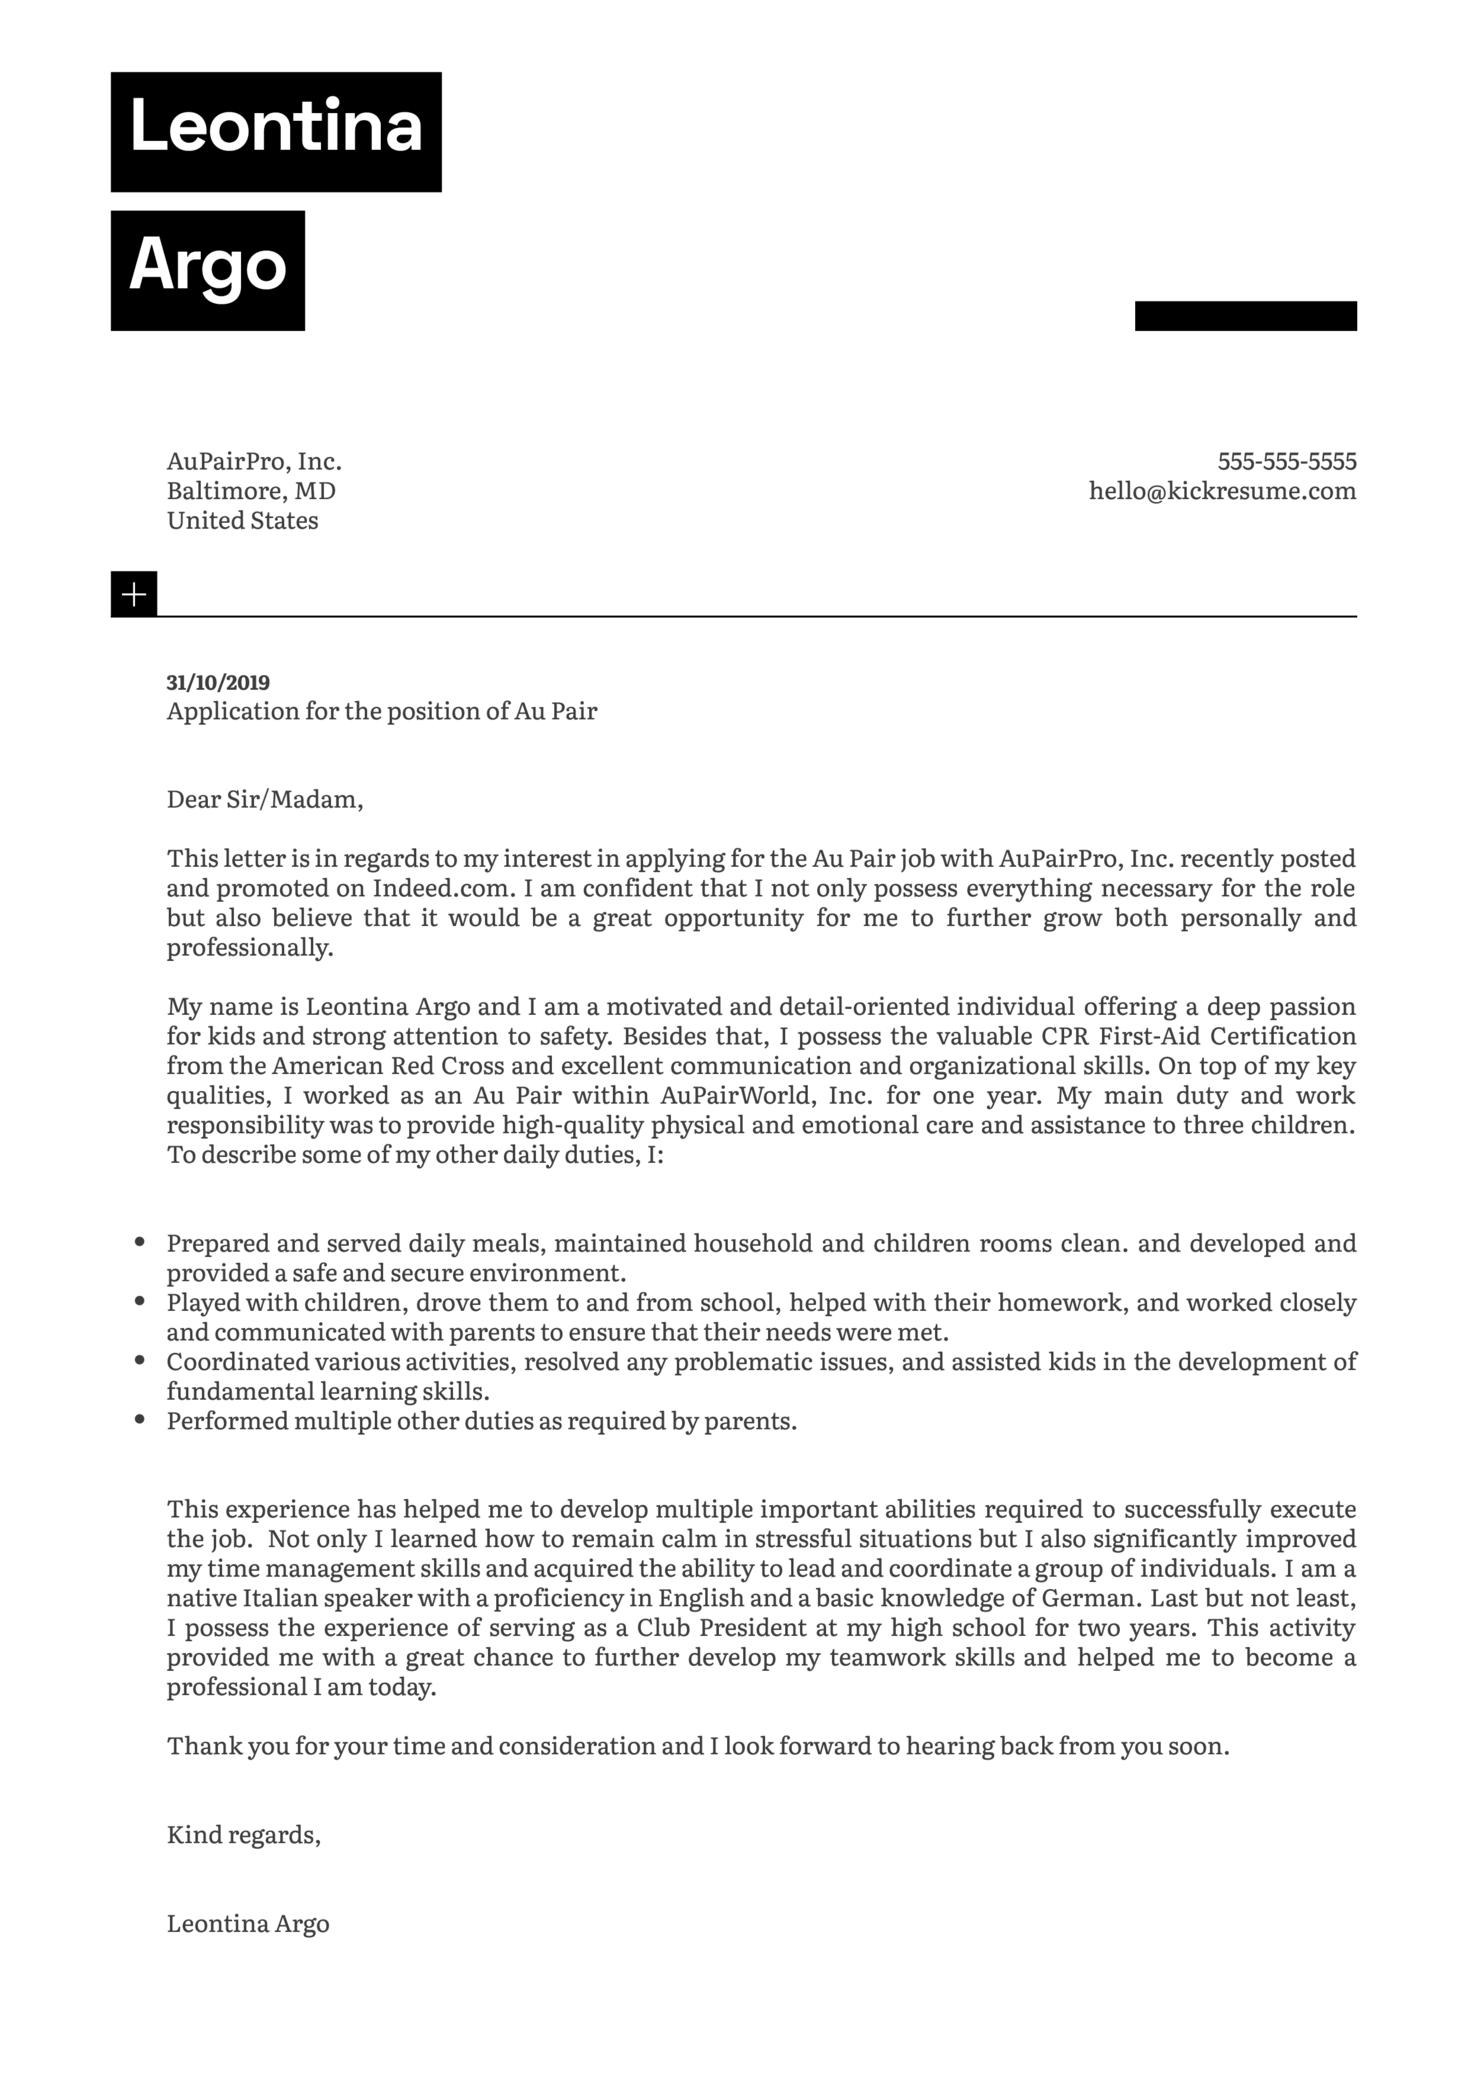 Au Pair Cover Letter Sample